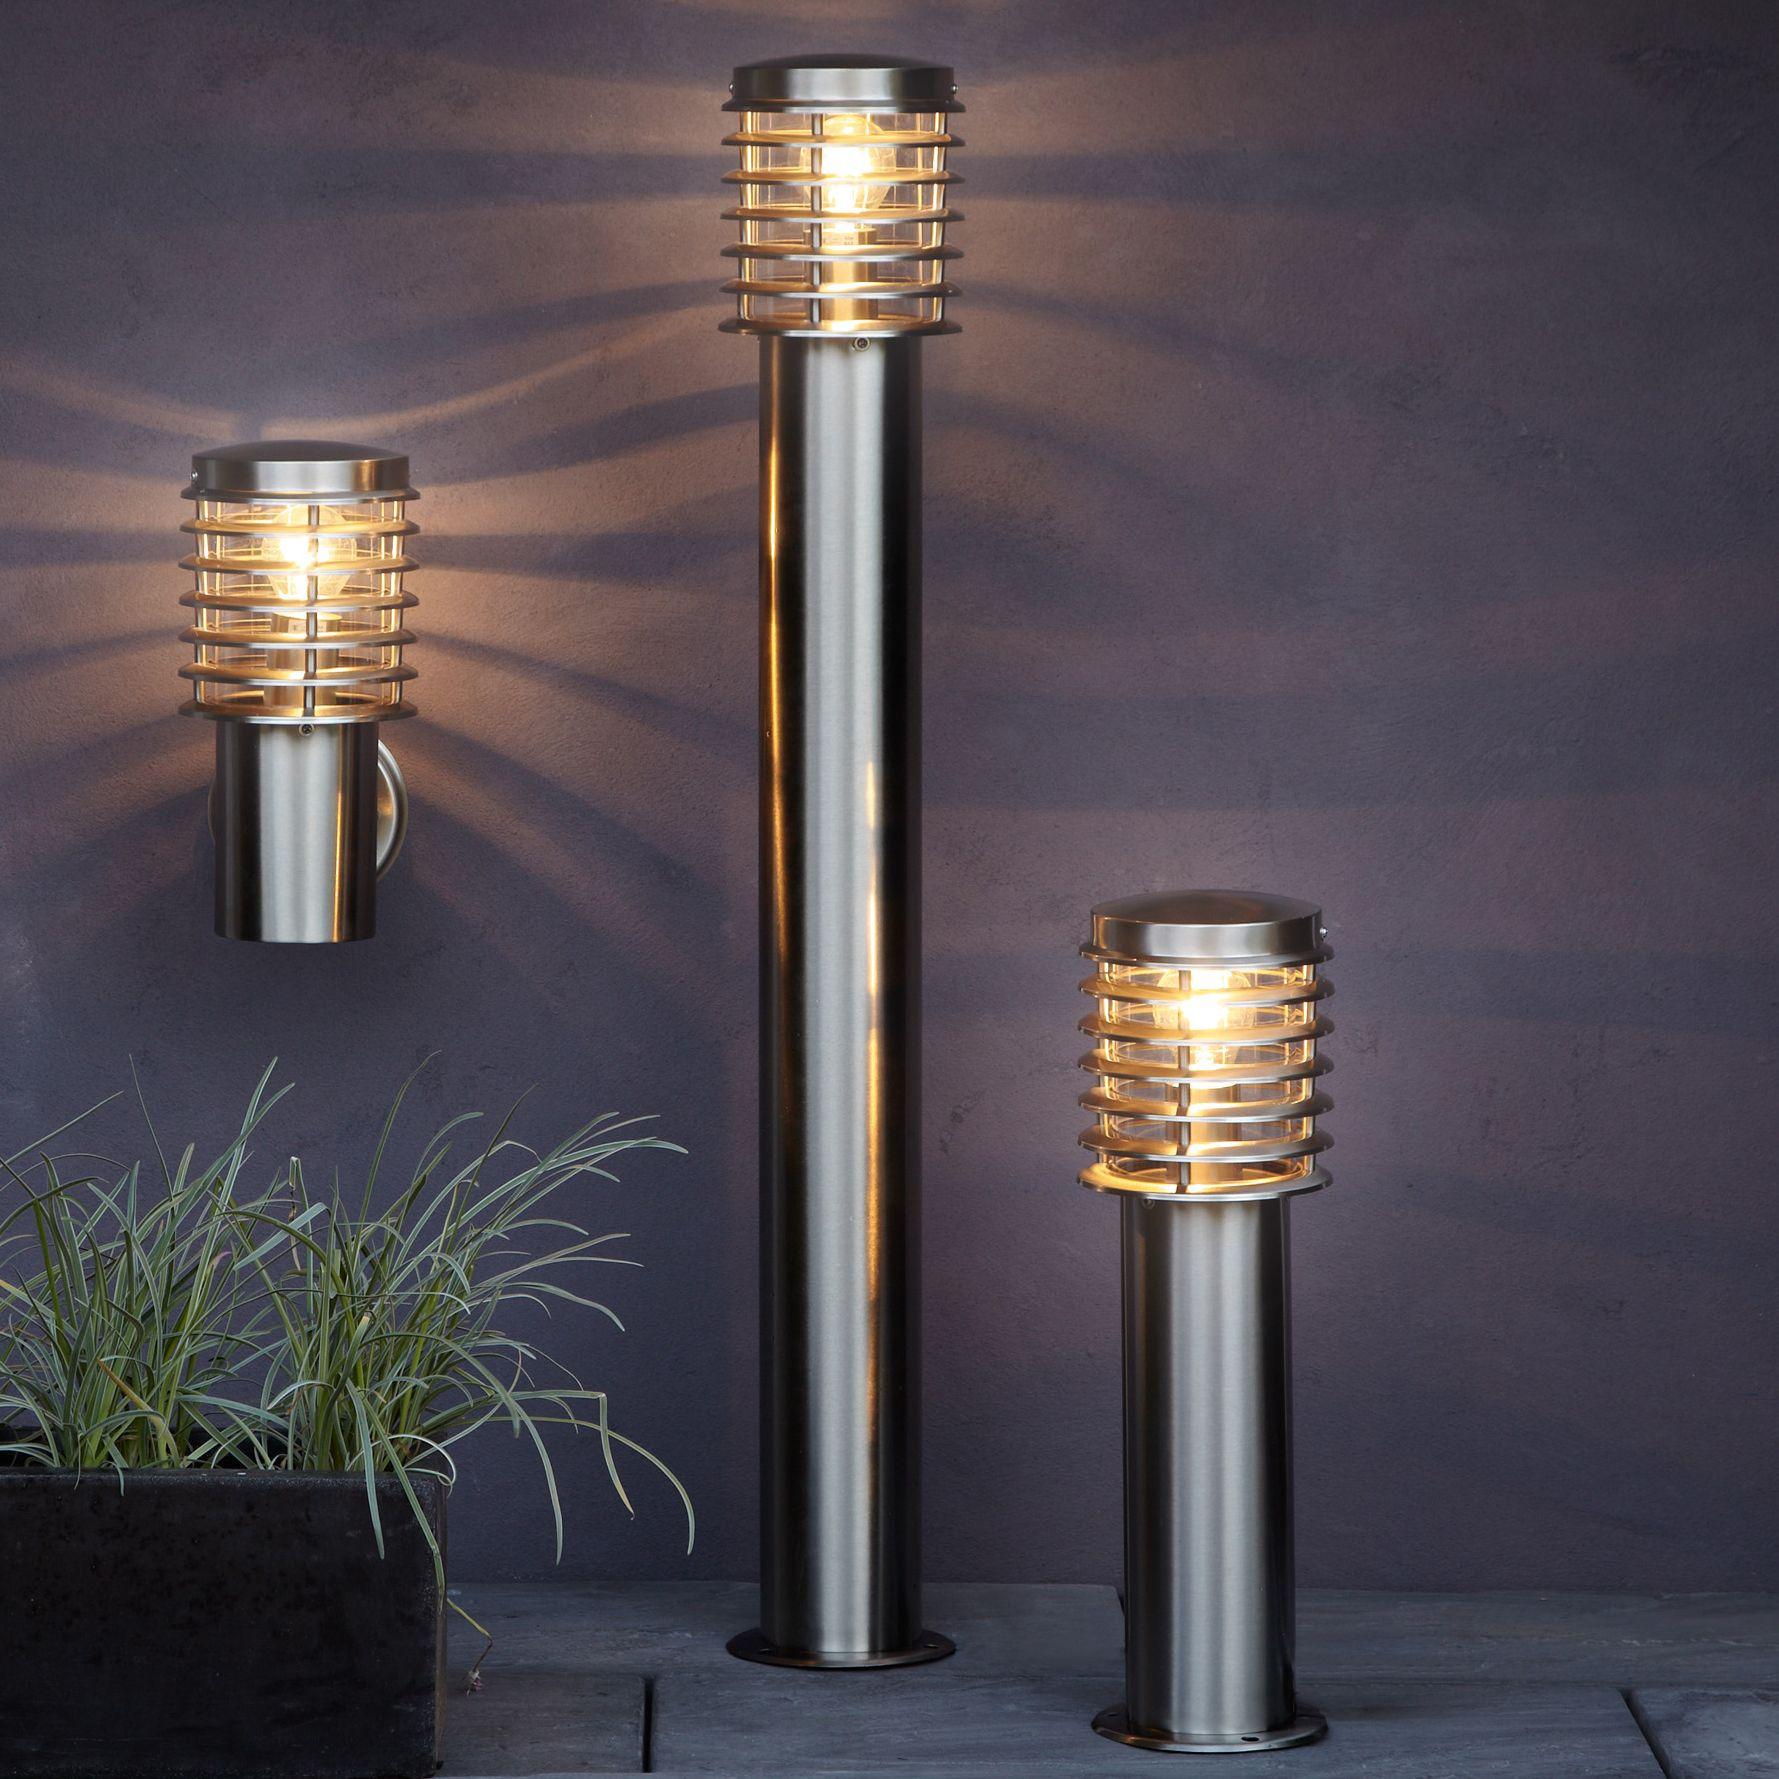 Marvelous Post Lights